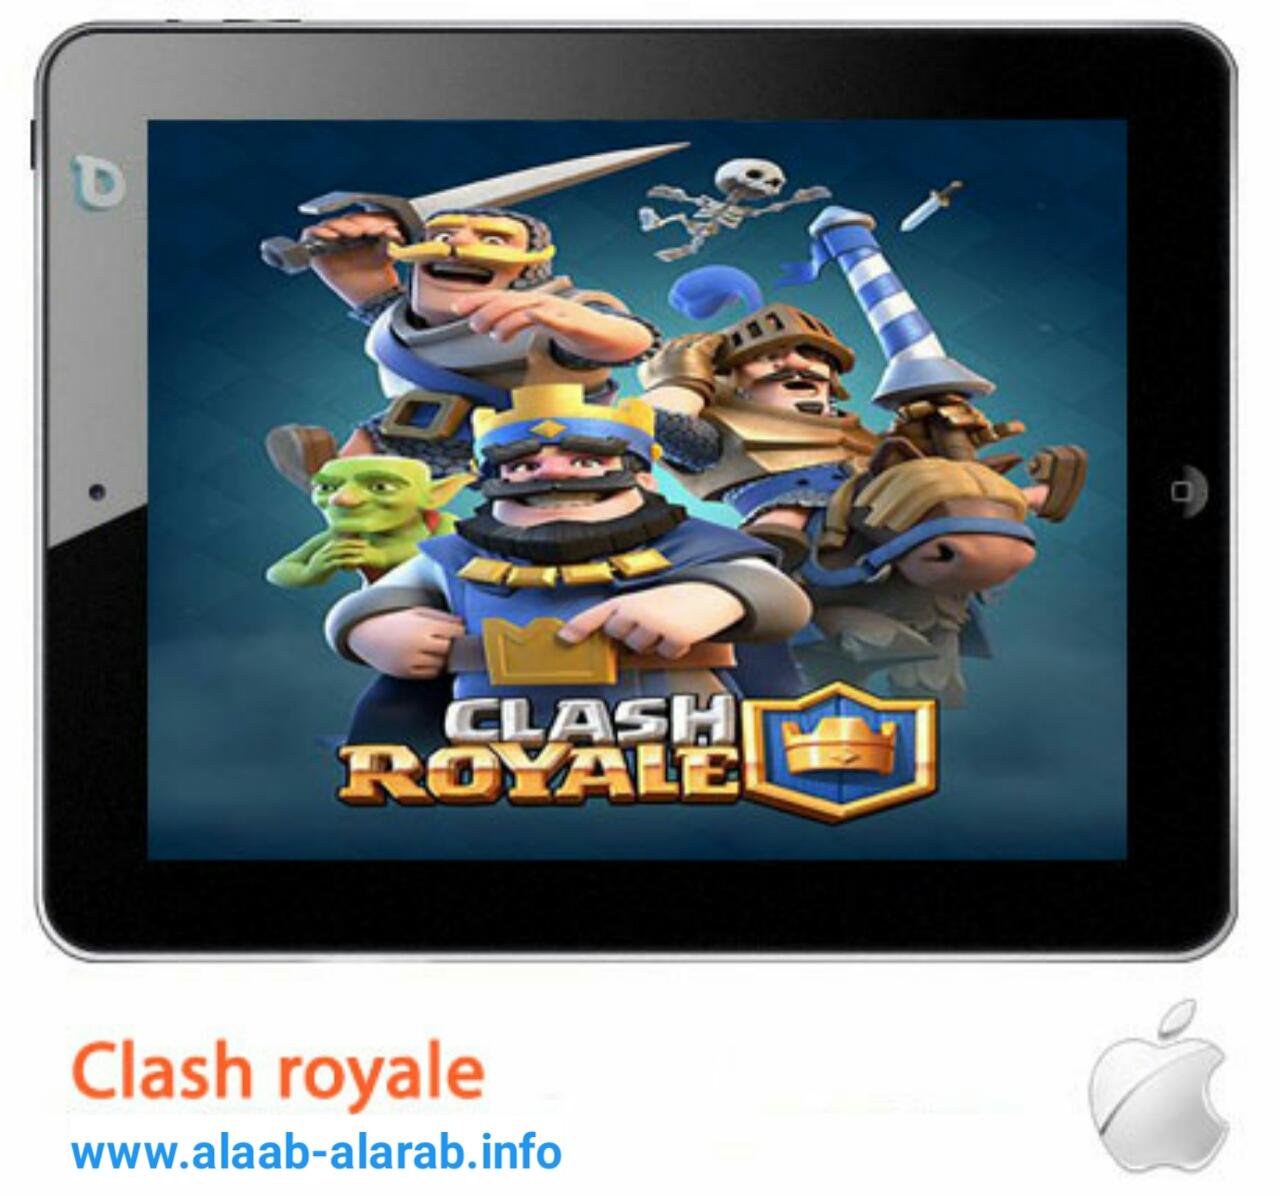 Clash royale v1.1.0